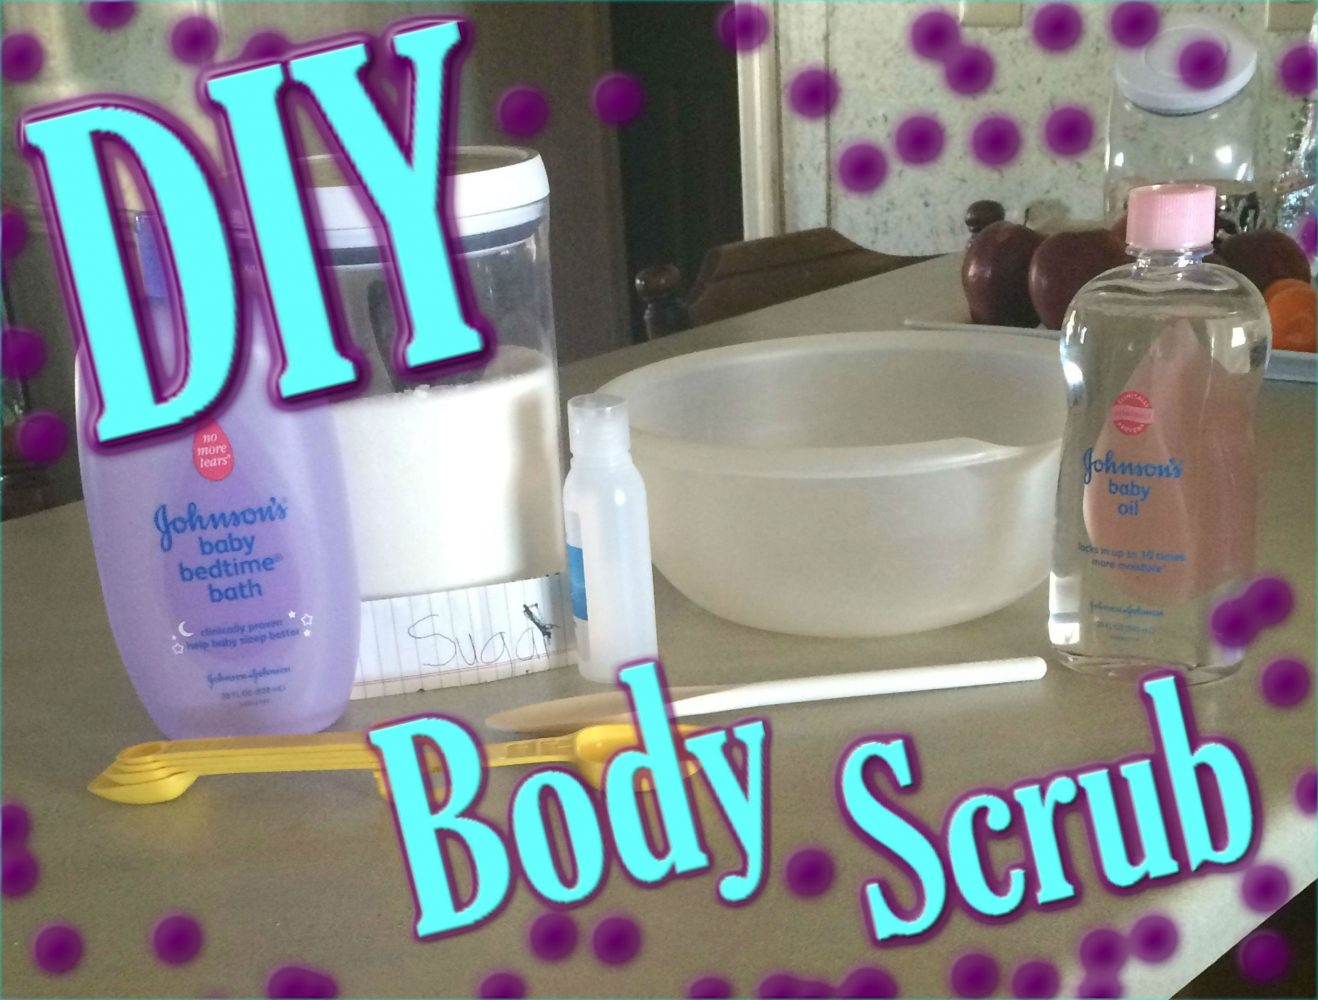 DIY: Quick and Easy Body Scrub